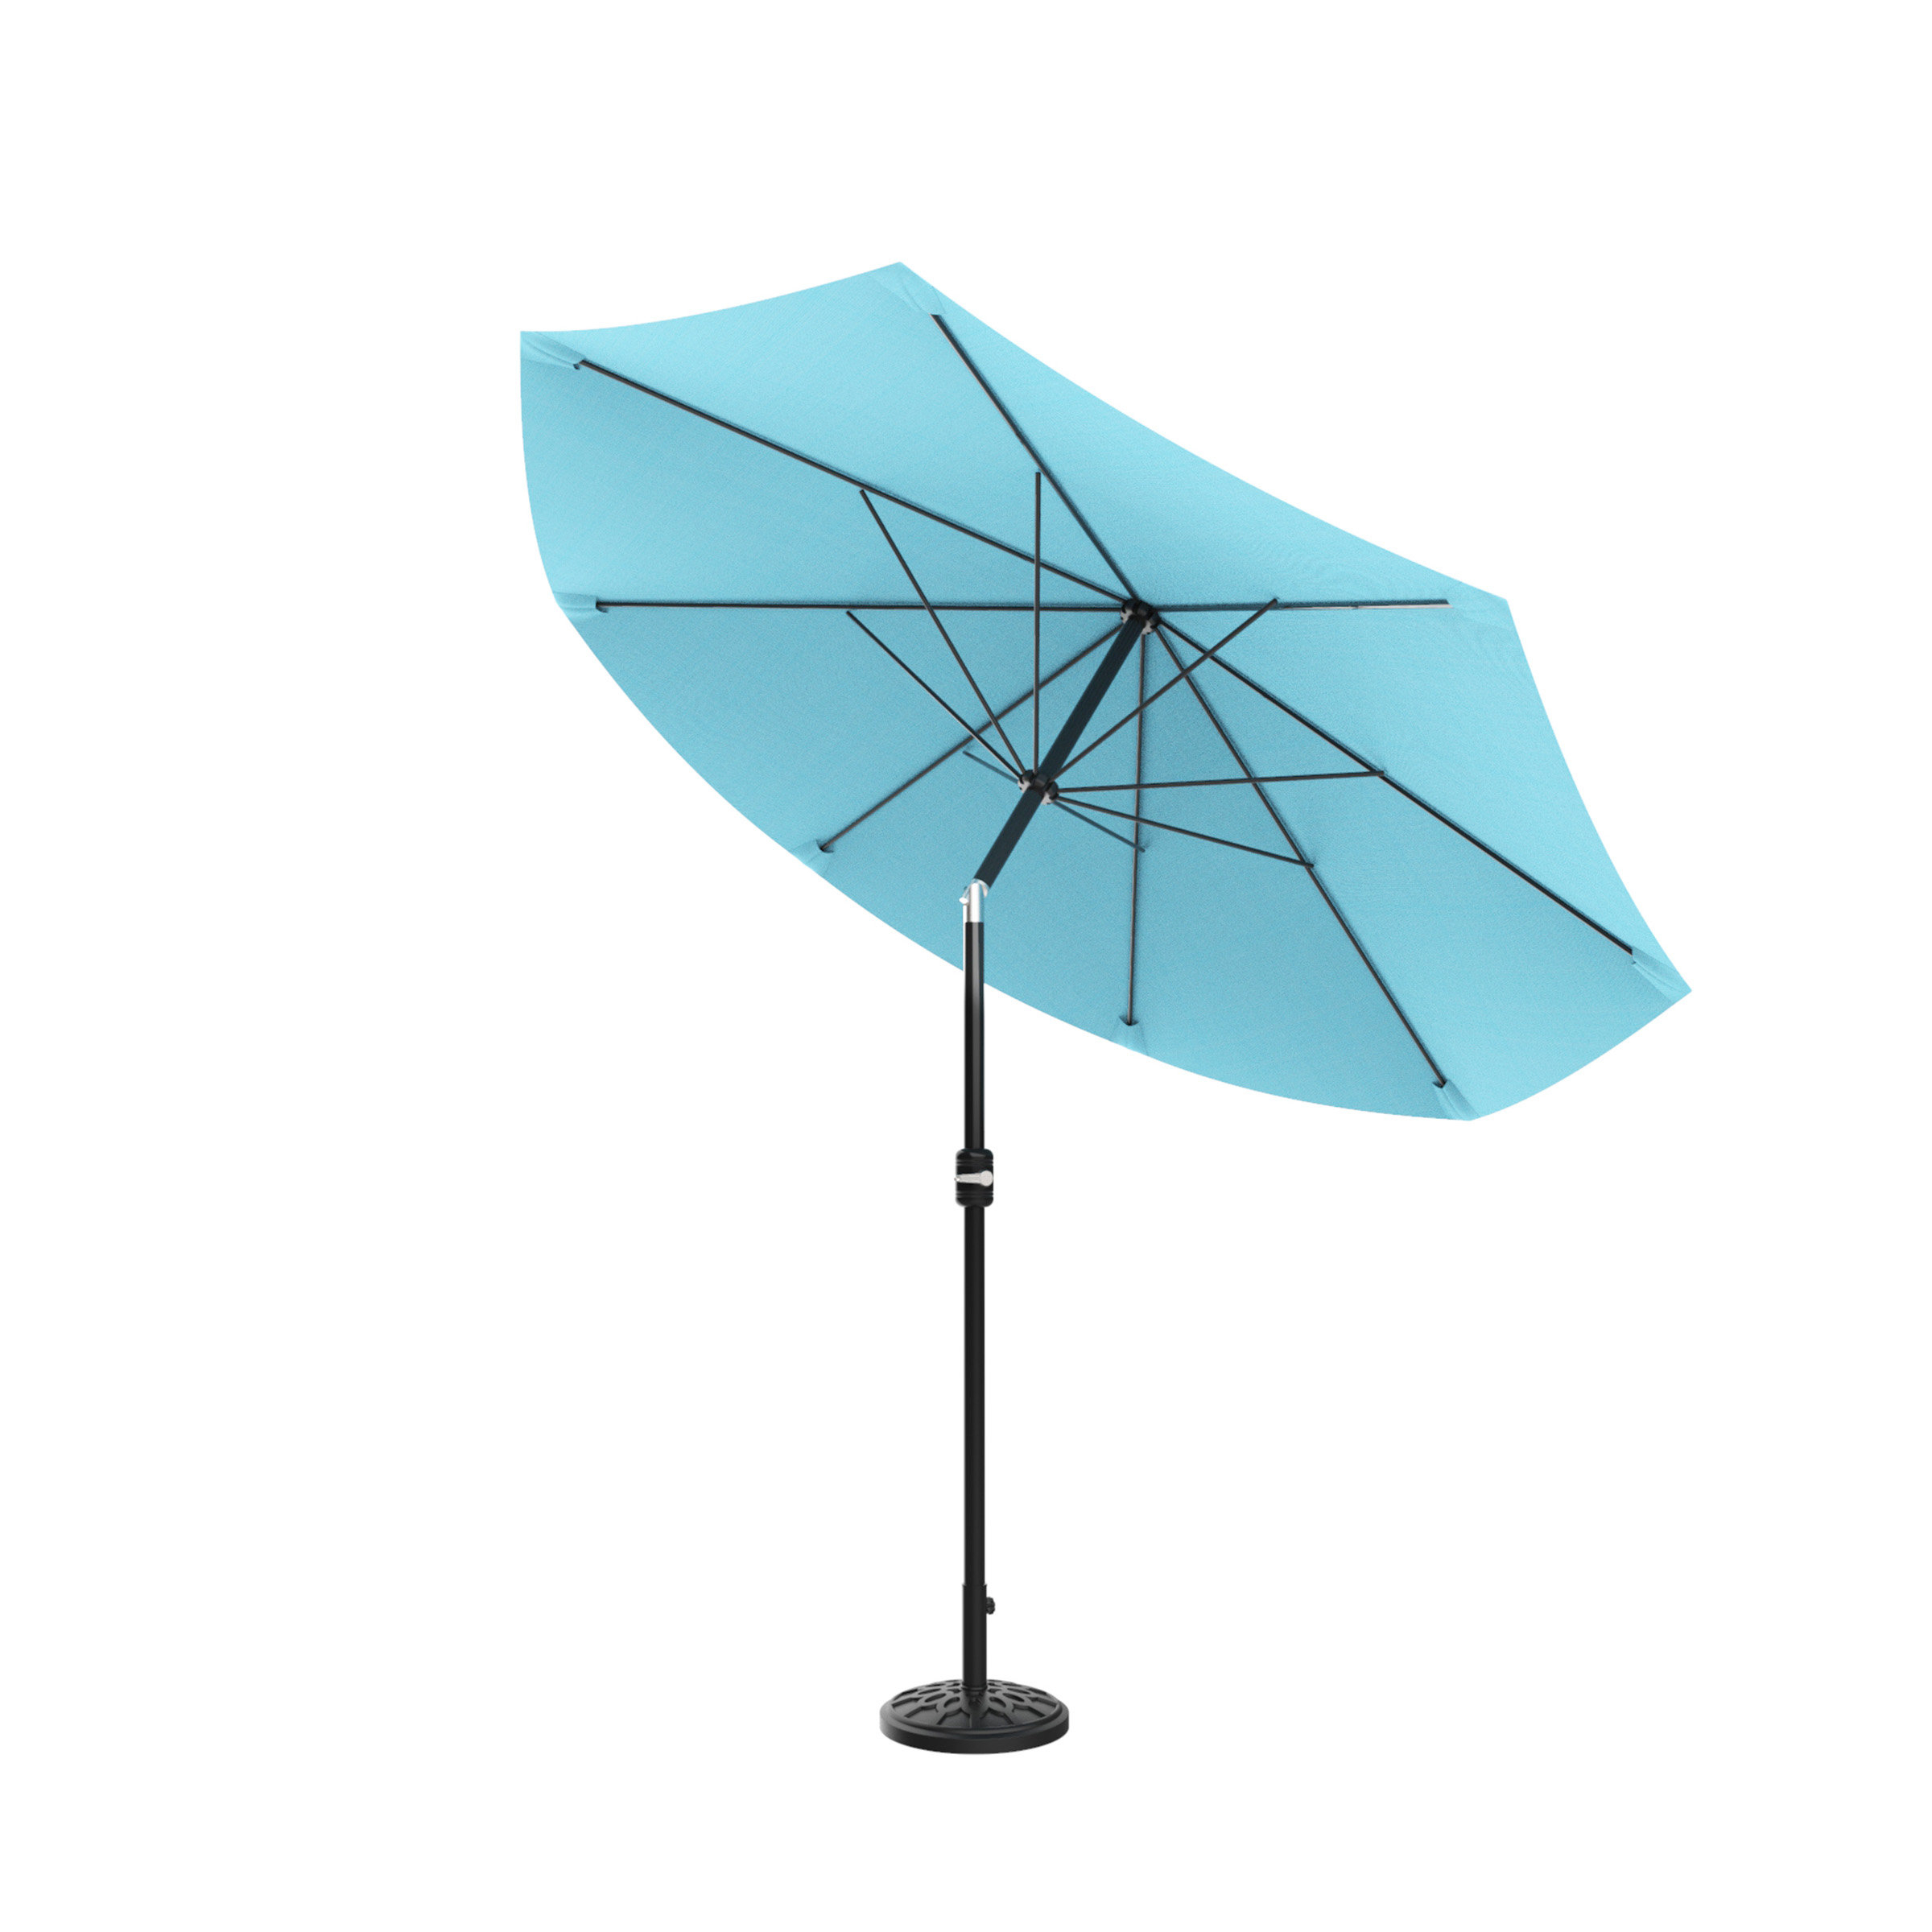 Kelton 10' Market Umbrella Within Well Liked Crowborough Market Umbrellas (View 10 of 20)